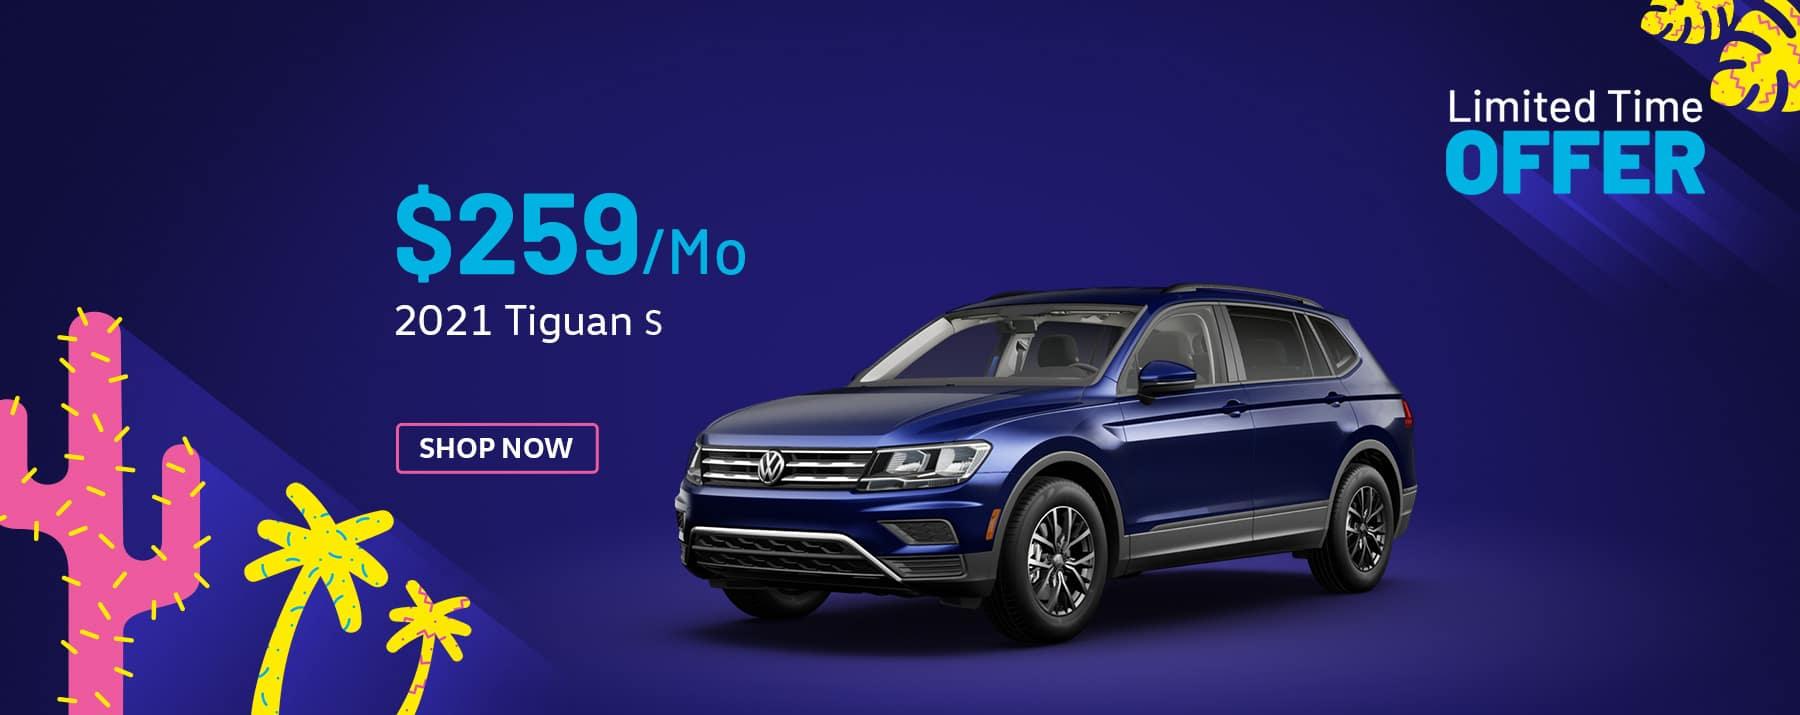 2021 VW Tiguan Special